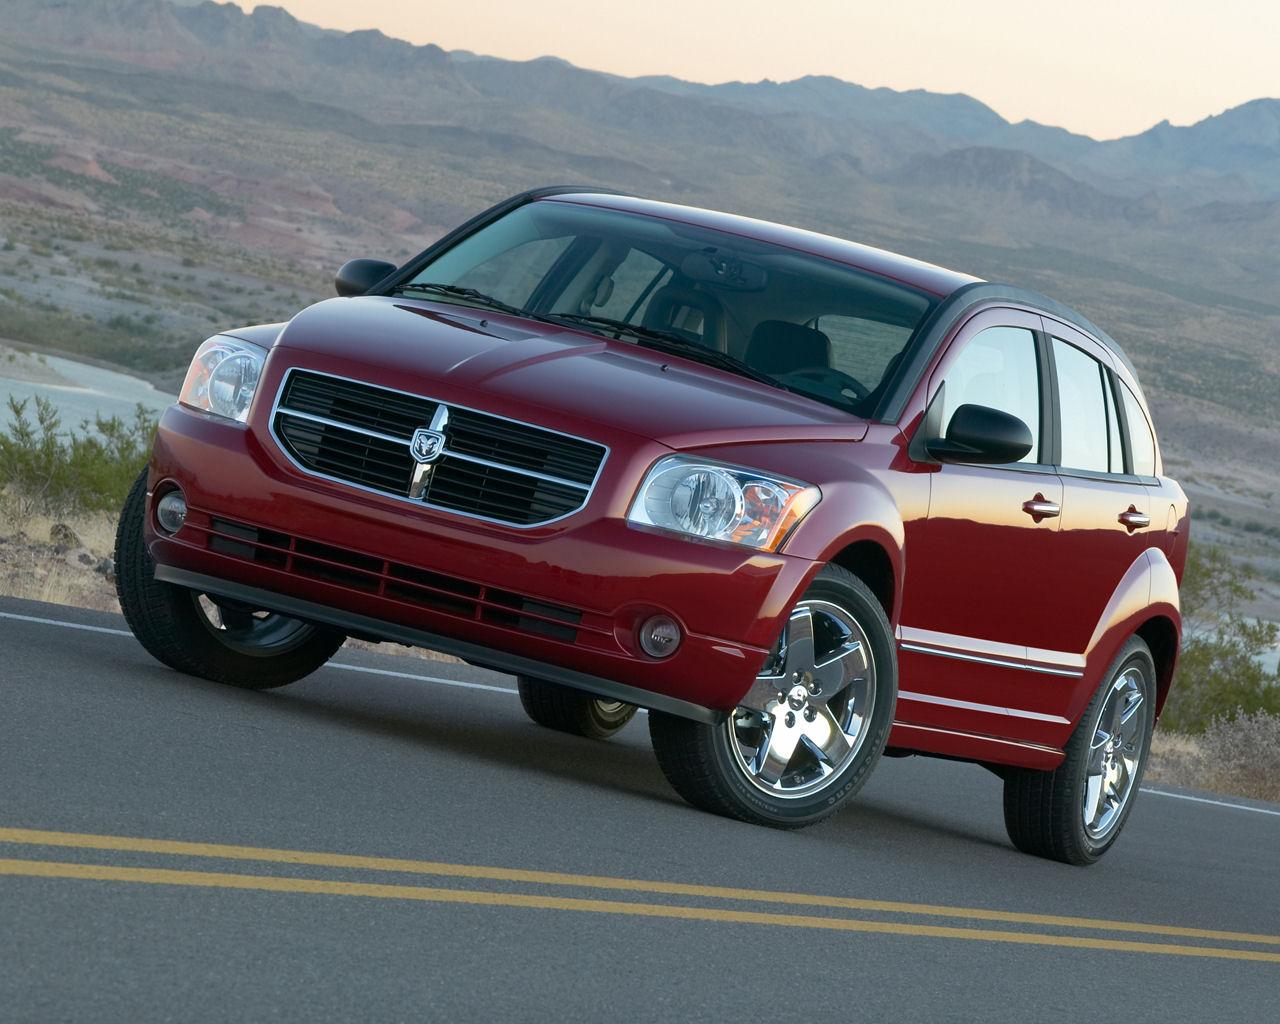 Dodge Caliber SE SXT RT SRT4   1280x1024 Wallpaper 1280x1024